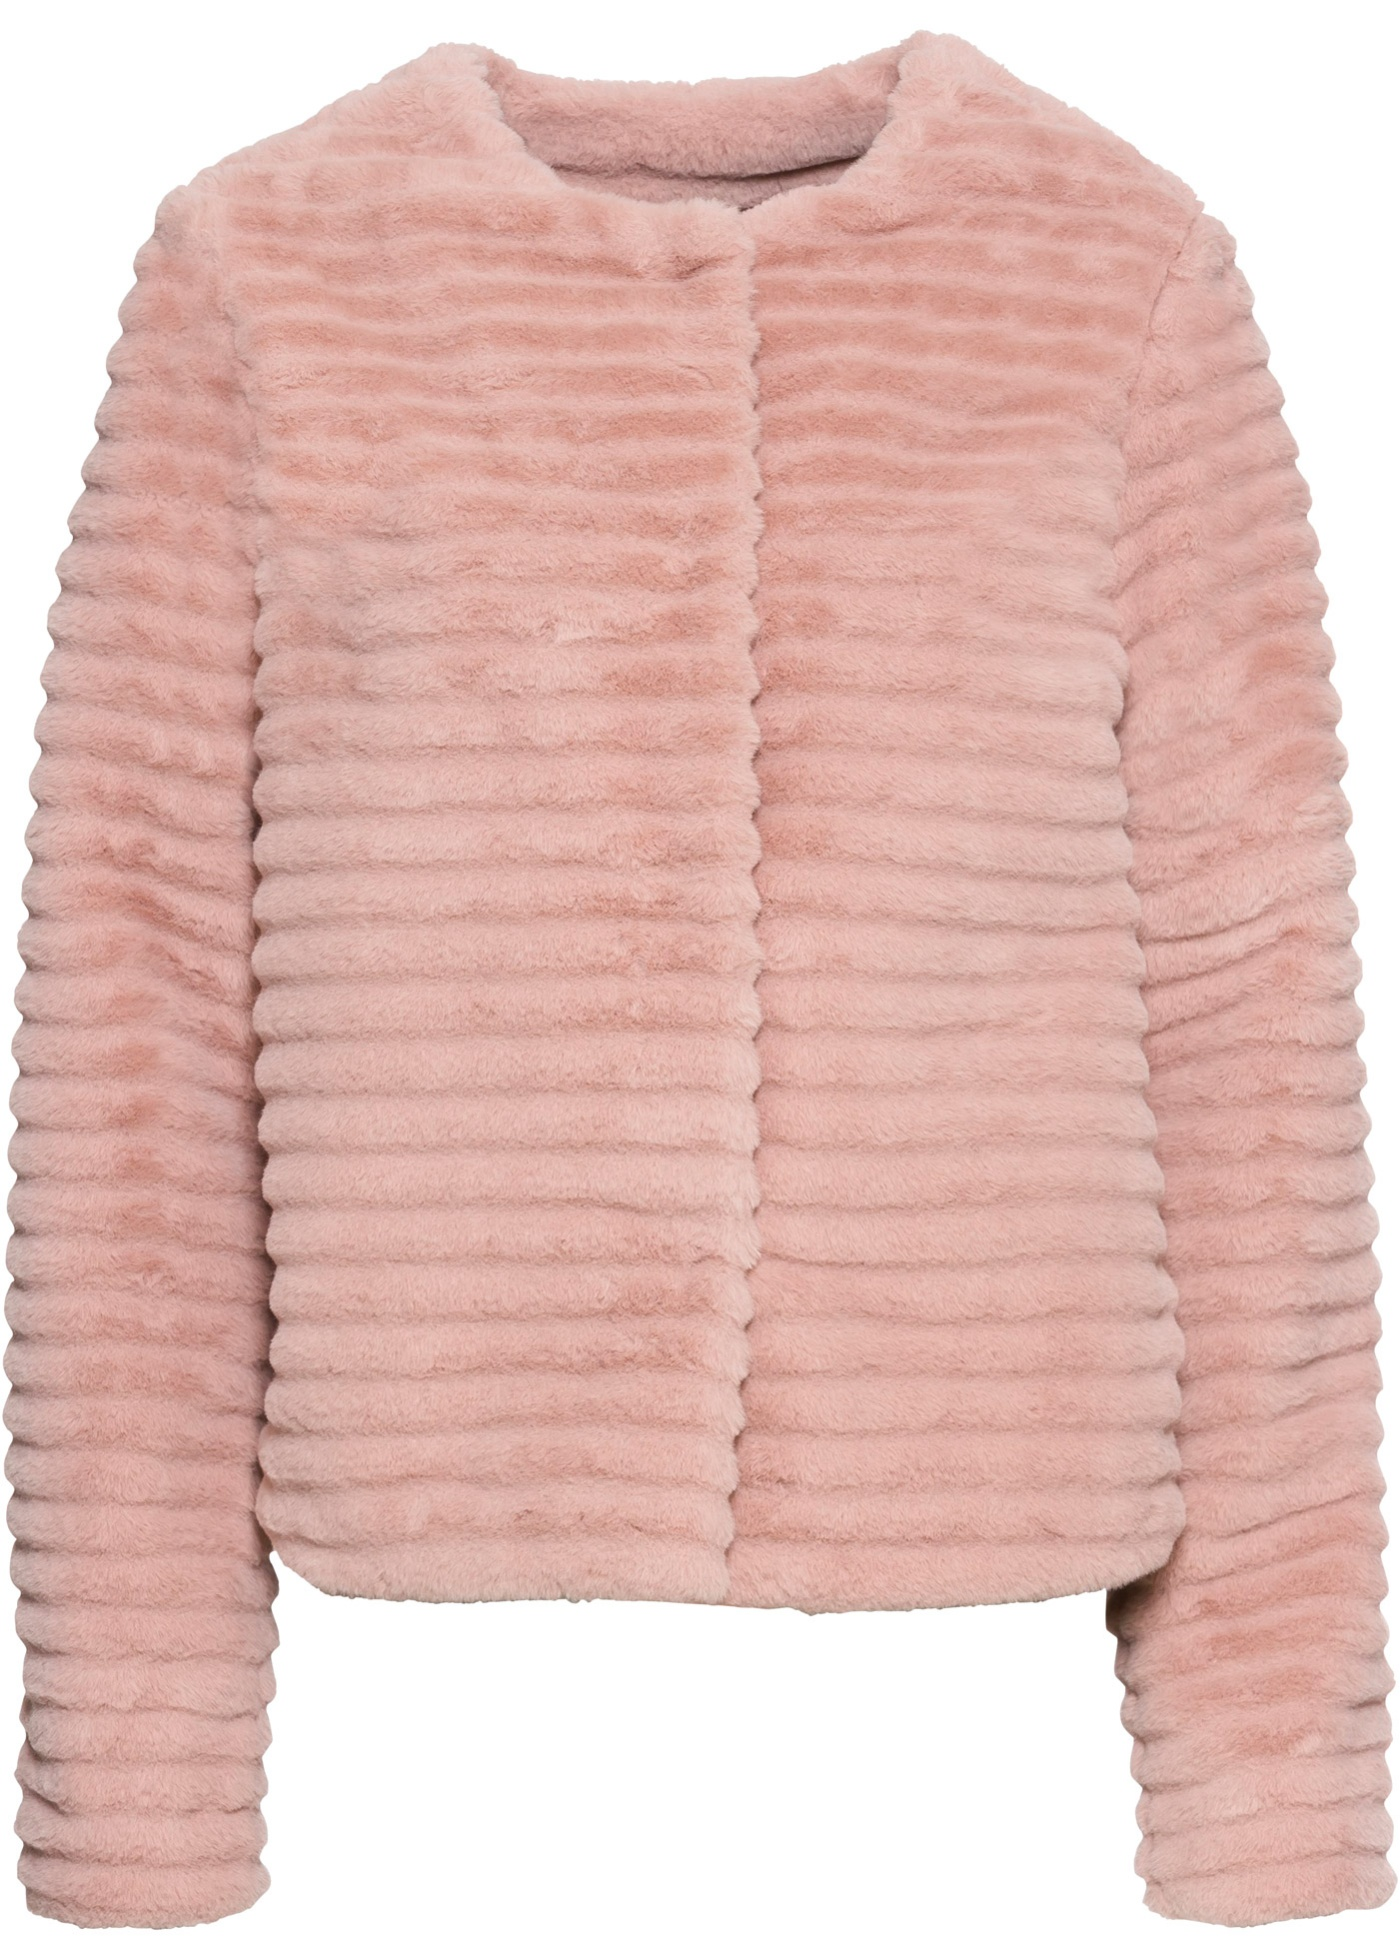 Fellimitat-Jacke langarm  in rosa für Damen von bonprix